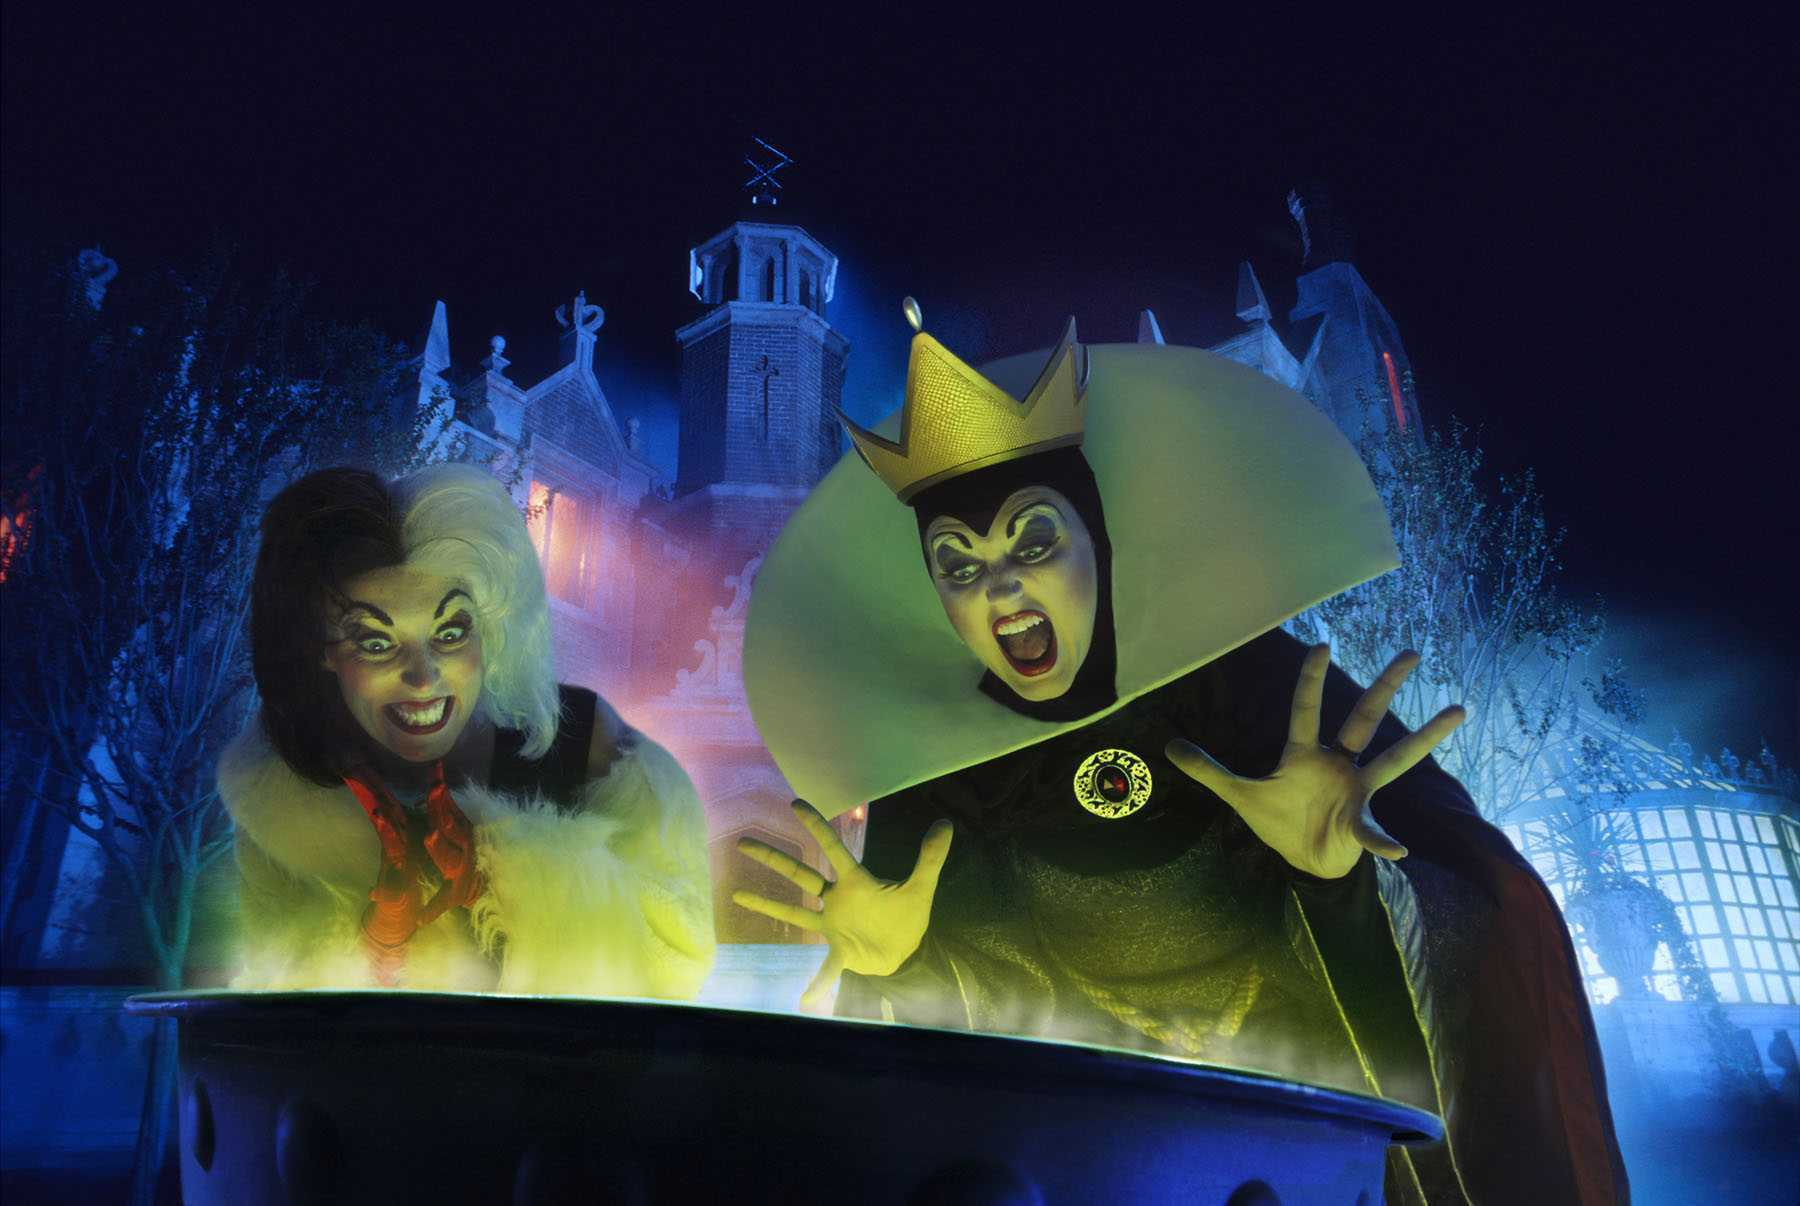 Disneys Atlantis The Villains: Disney World Halloween Party Changes